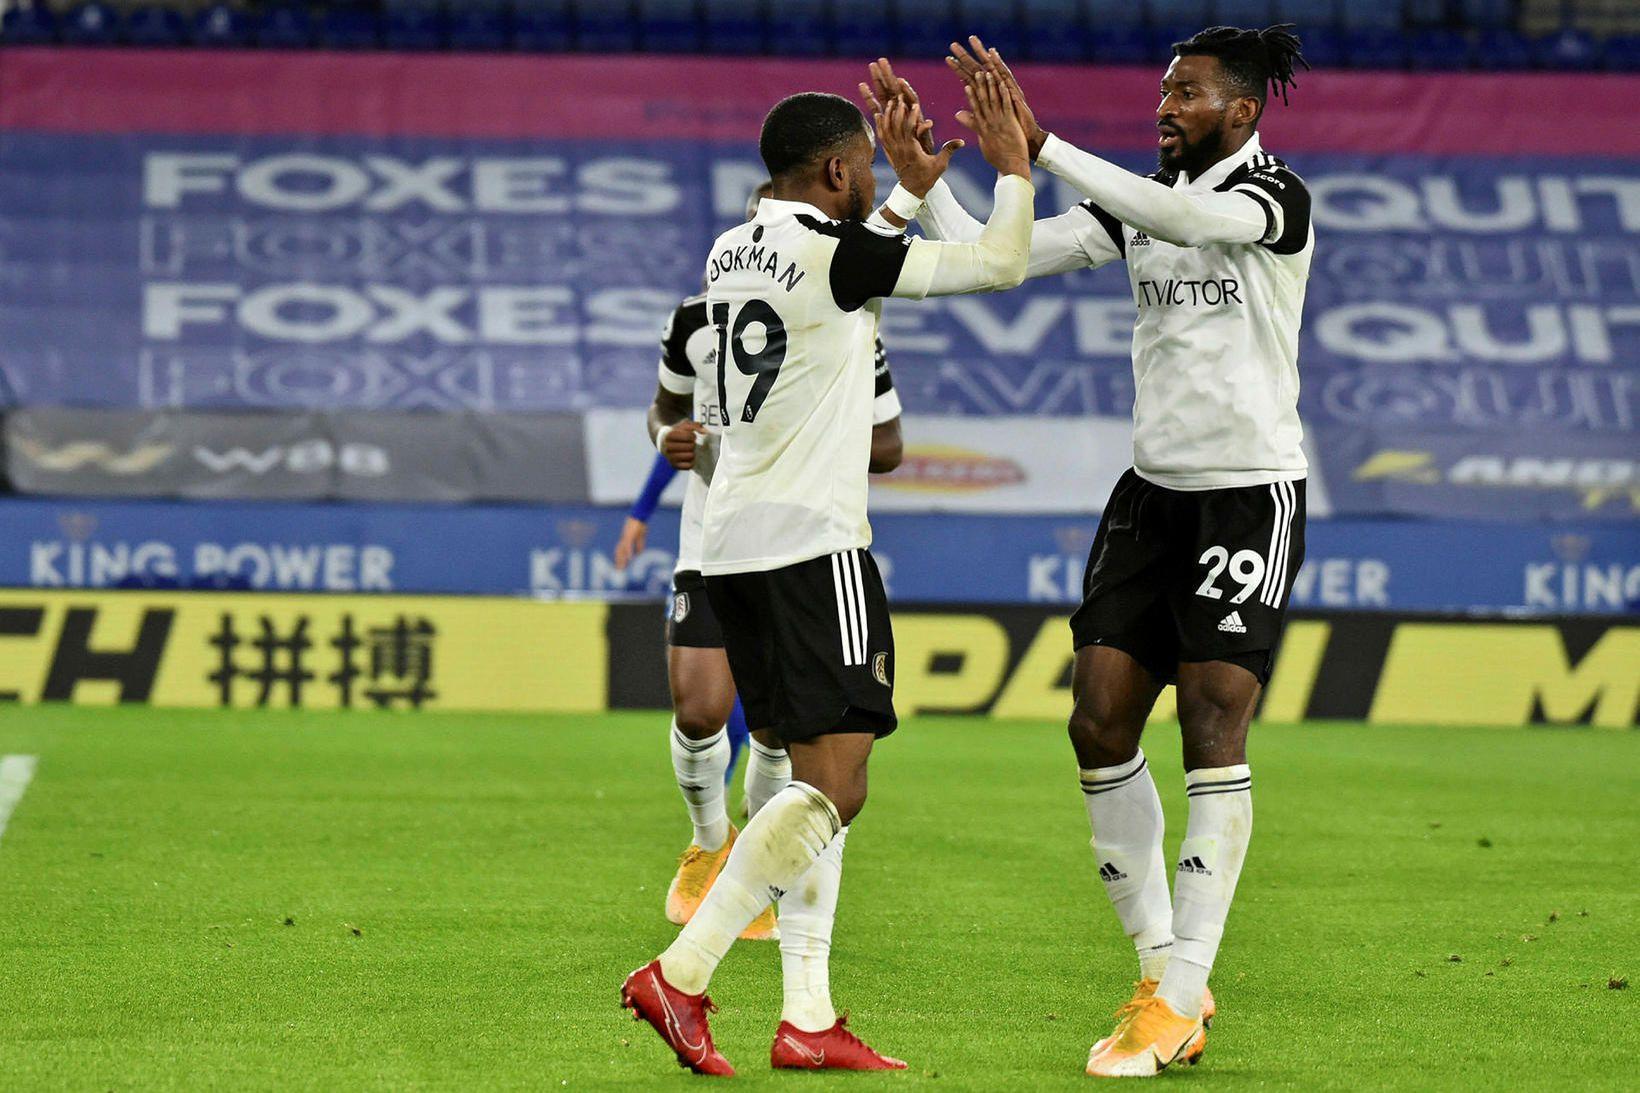 Ademola Lookman og Andre-Frank Zambo Anguissa fagna gegn Leicester í …